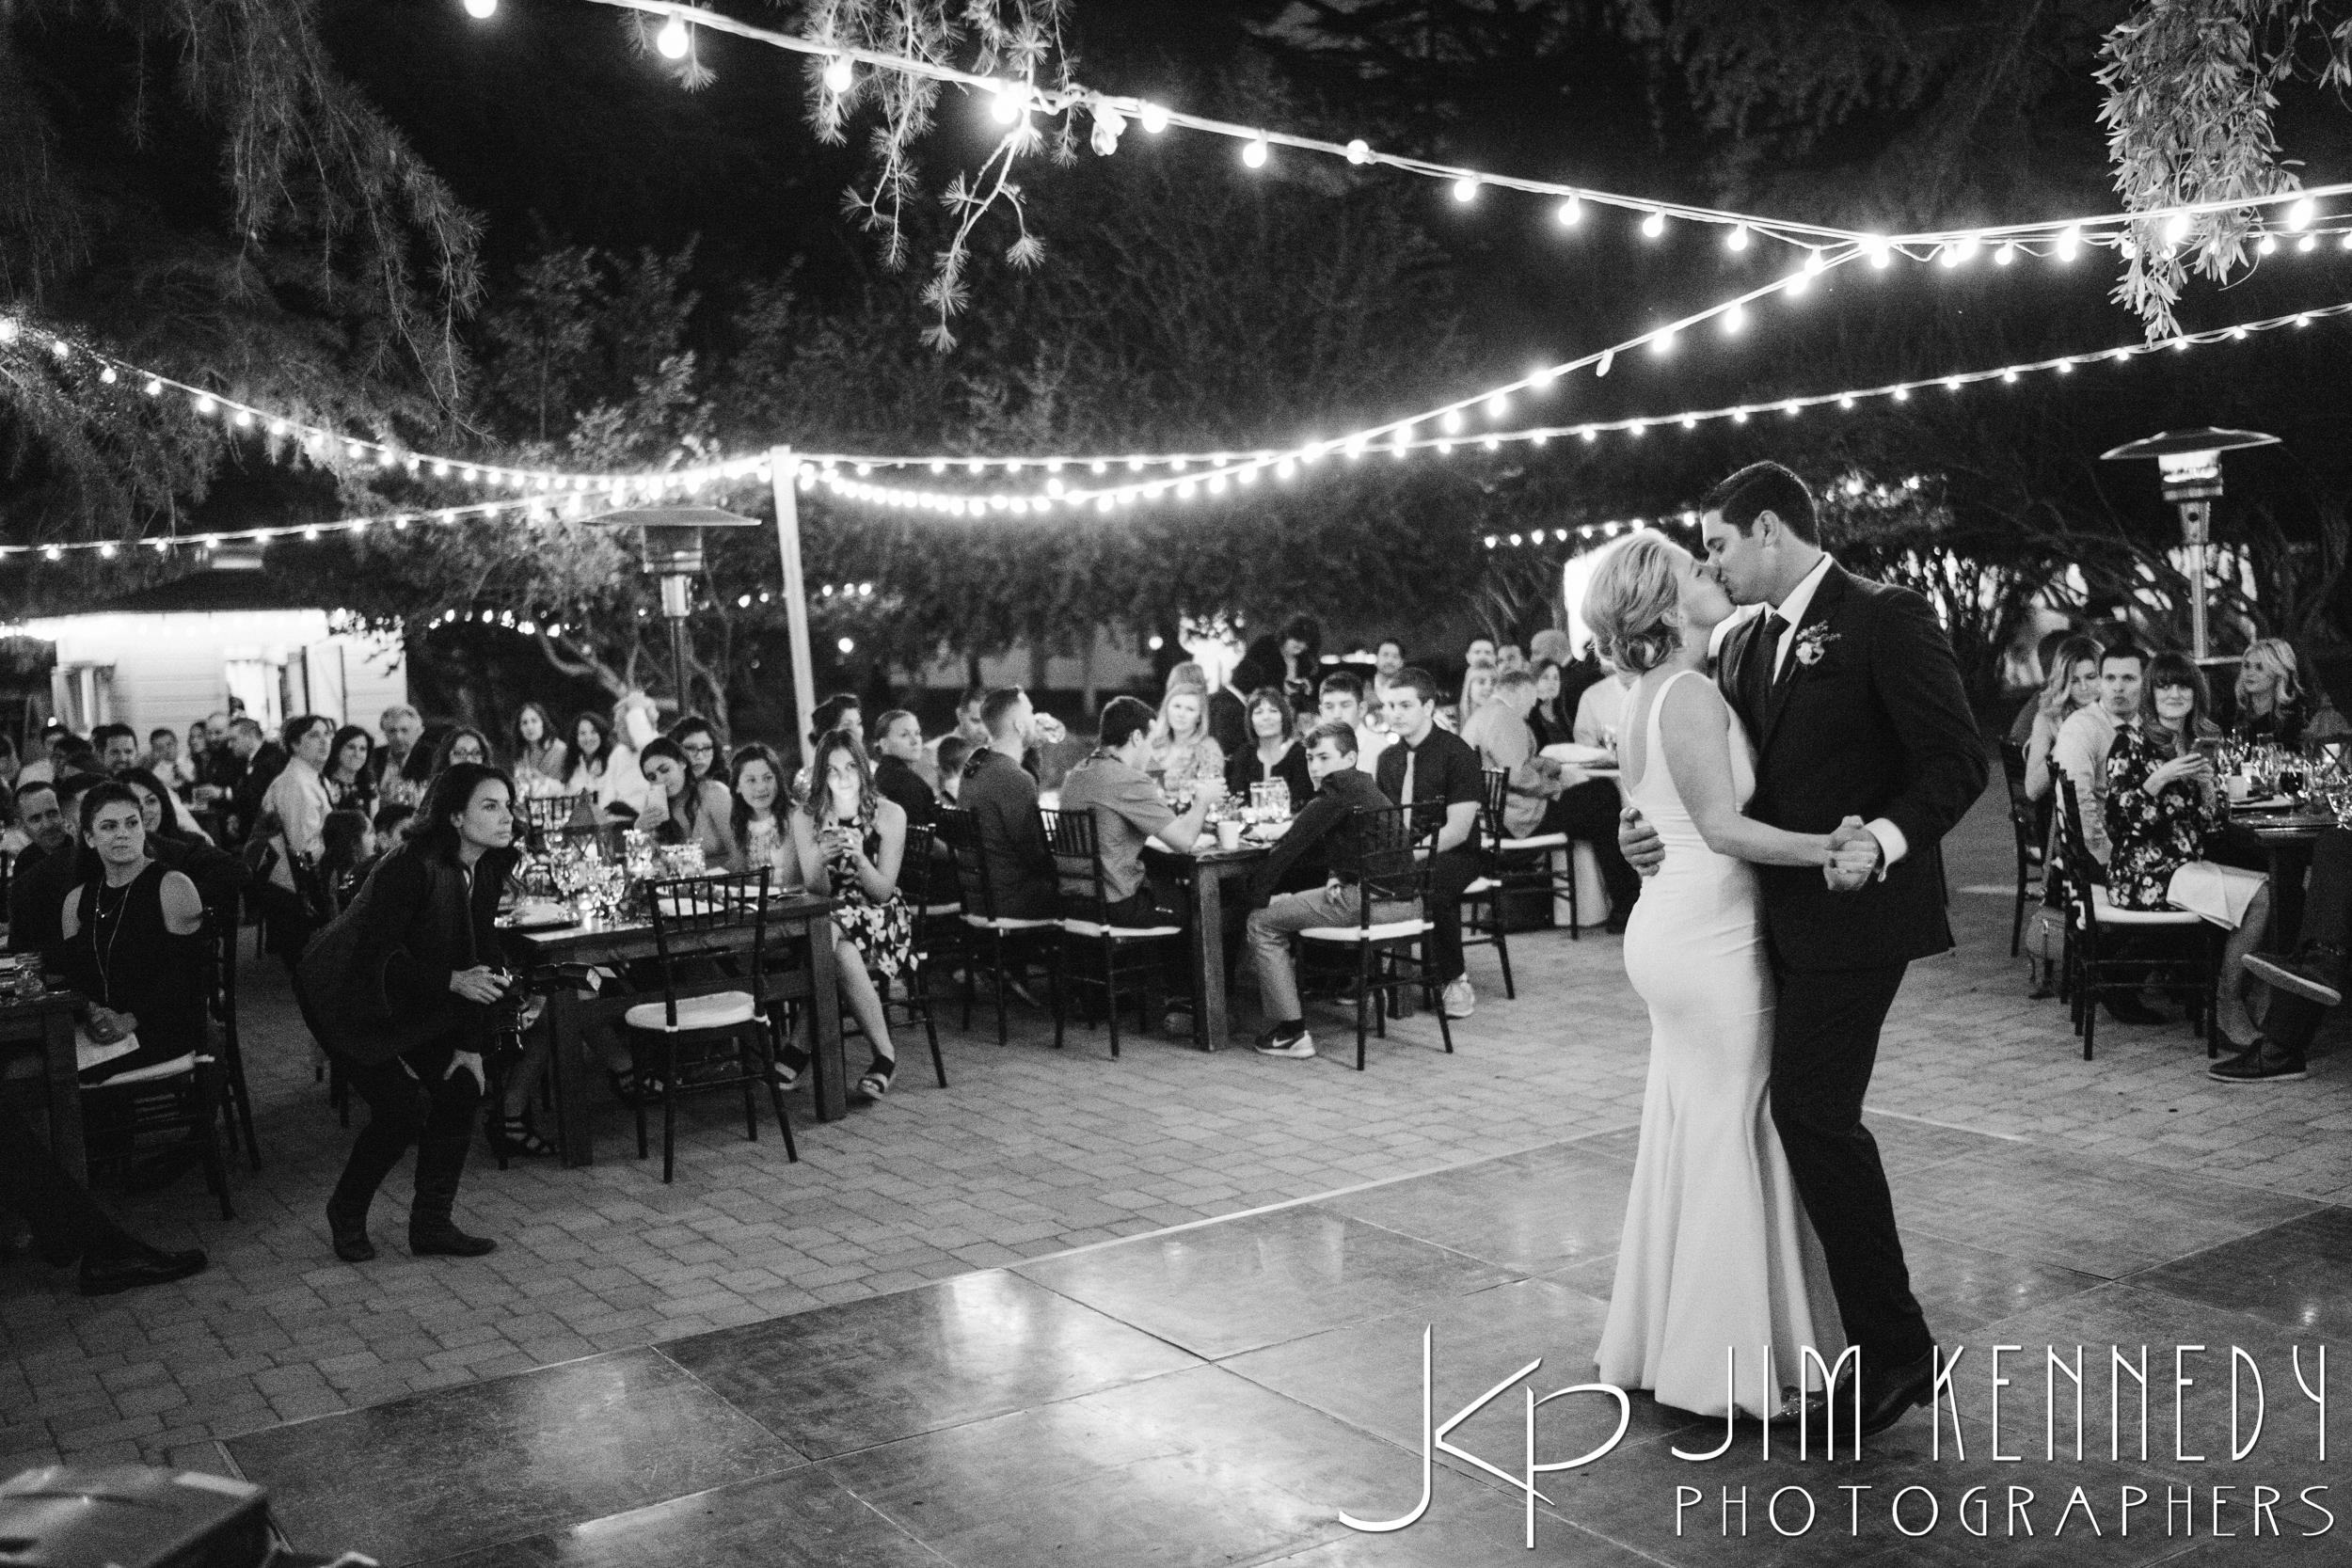 jim_kennedy_photographers_highland_springs_wedding_caitlyn_0186.jpg